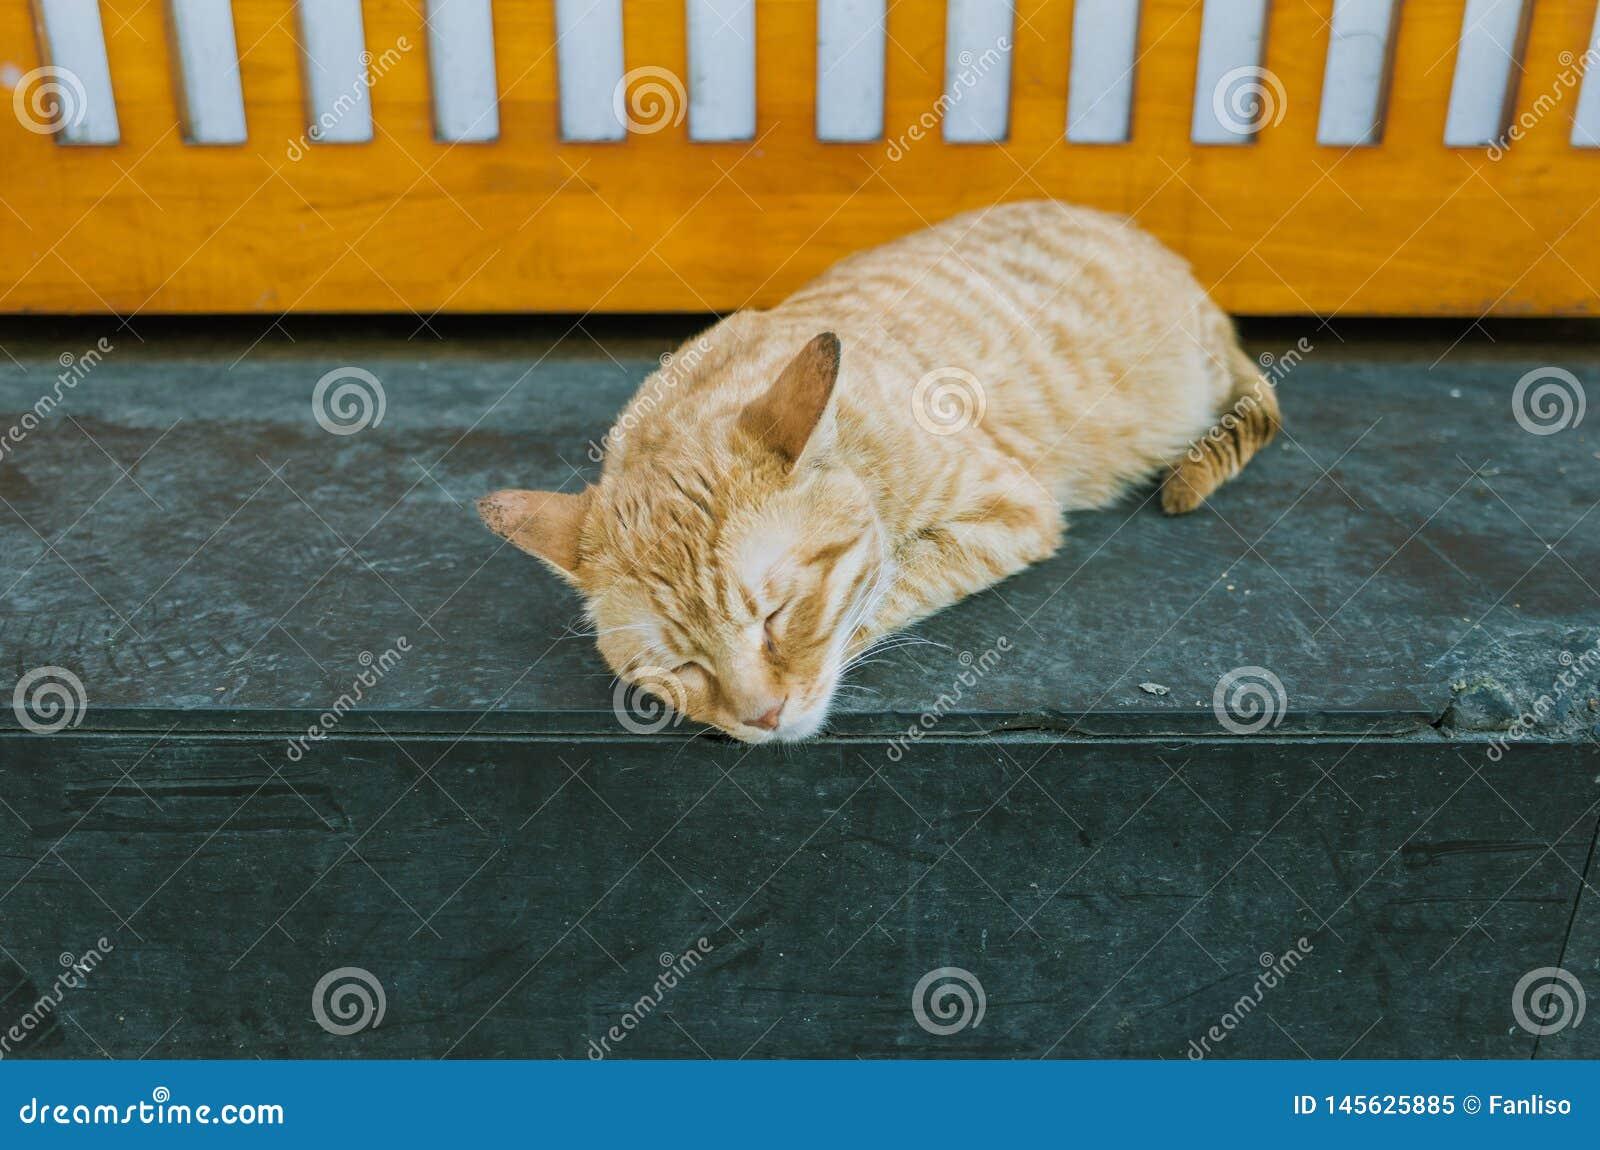 An orange cat sleeping at a shop corner